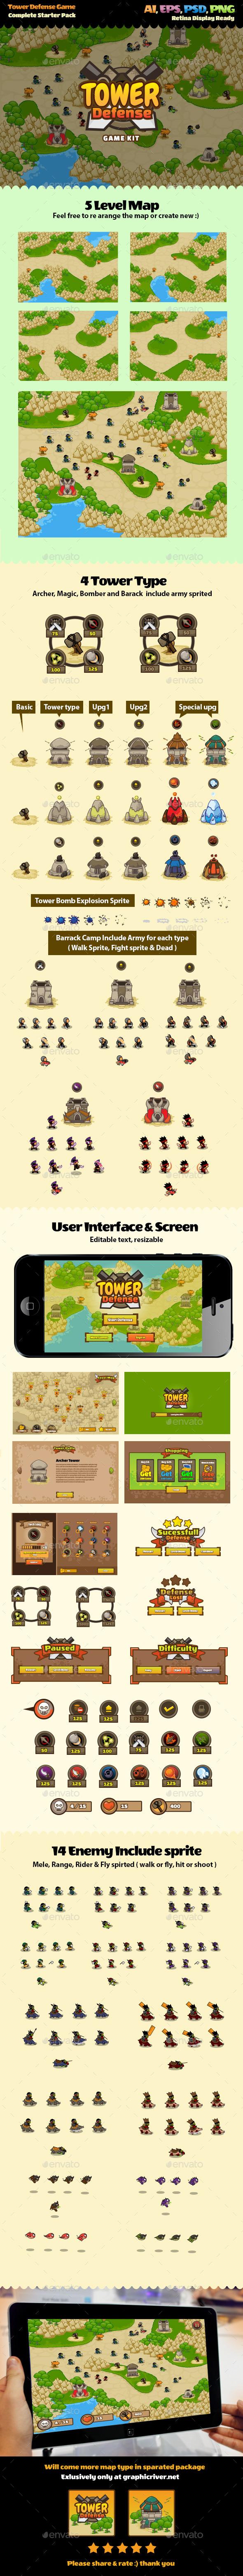 Tower Defense Game Kit - Game Kits Game Assets